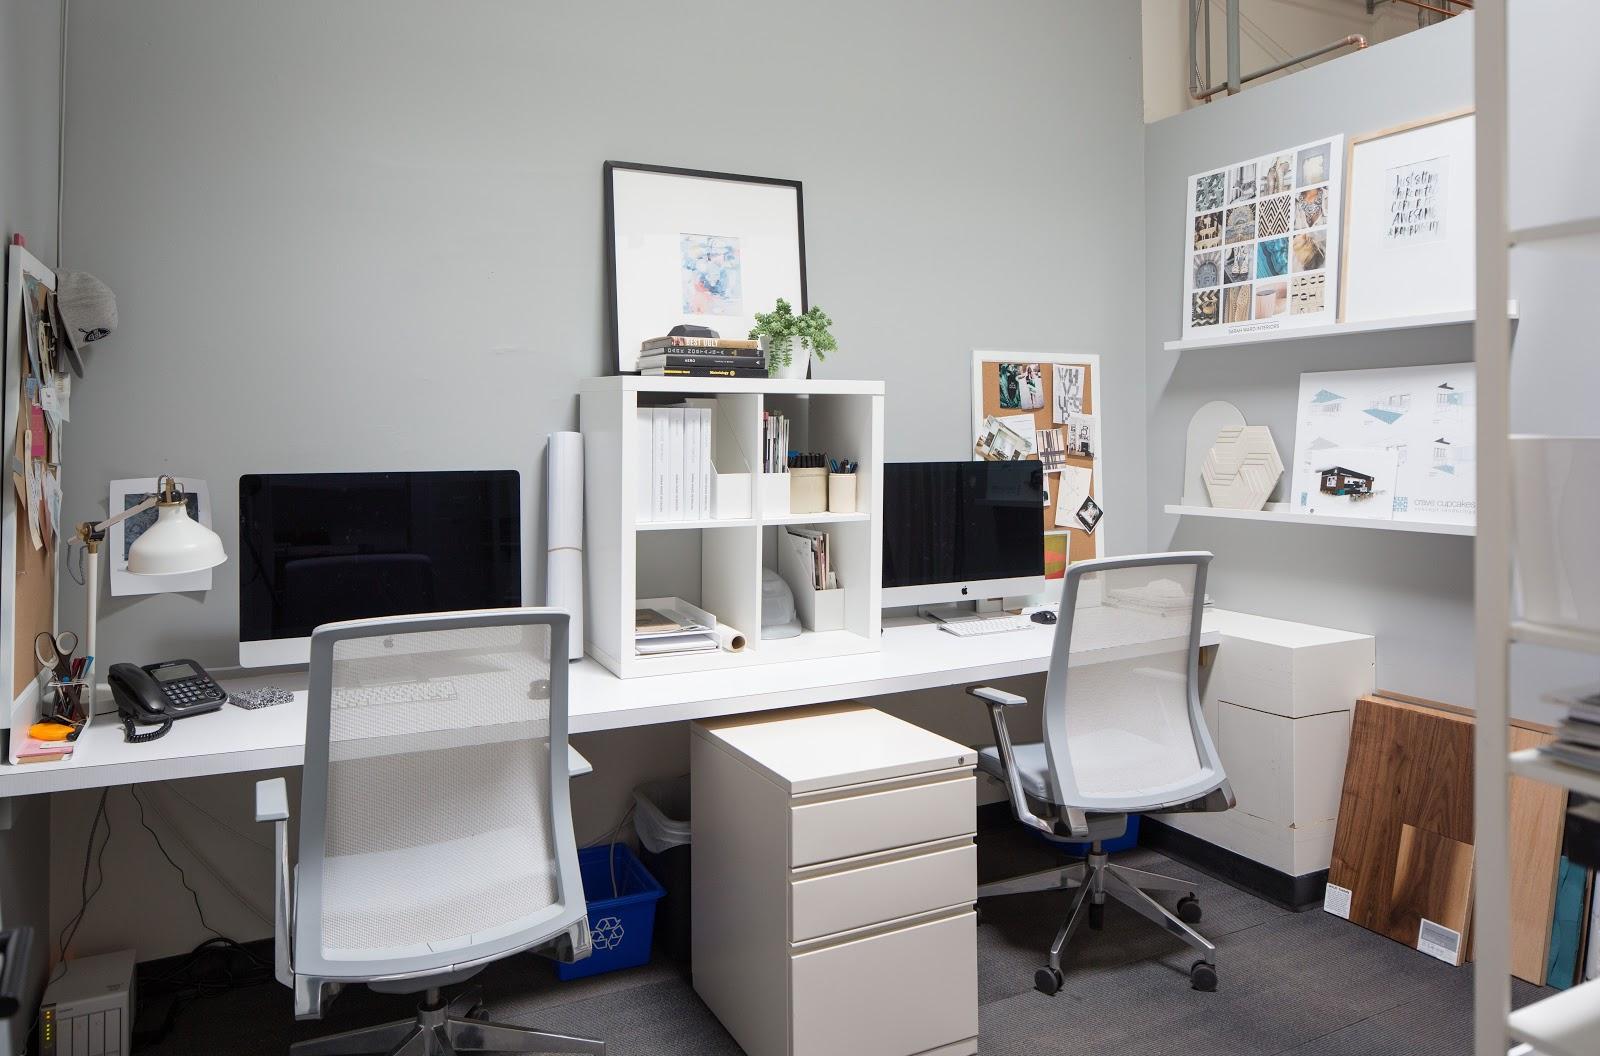 calgary coworking space female entrepreneurs creatives offices hot desks